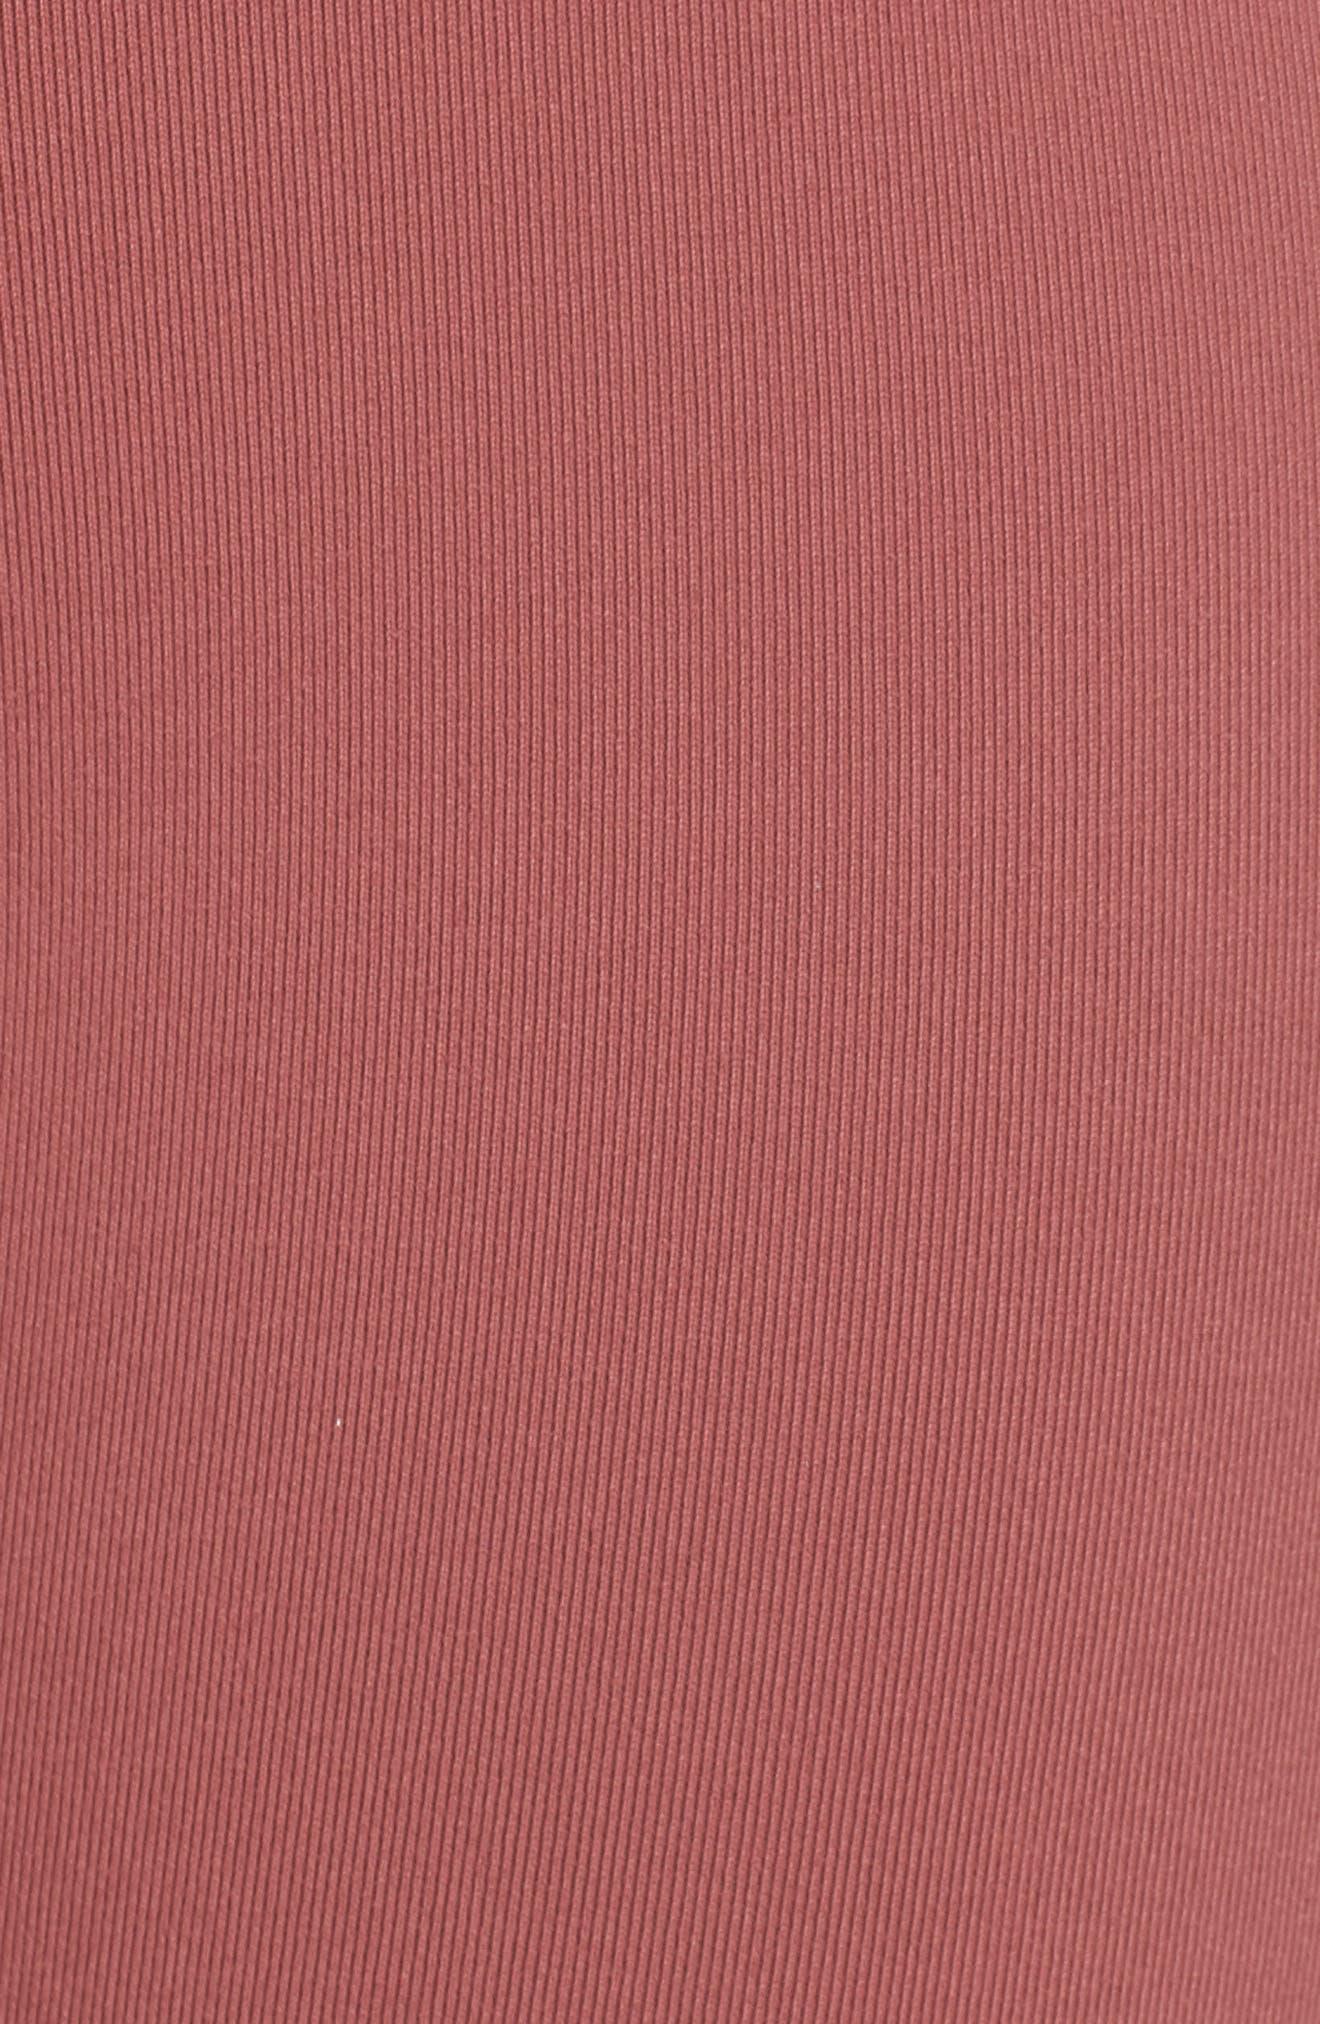 High Waist Airbrush Midi Leggings,                             Alternate thumbnail 6, color,                             ROSEWOOD